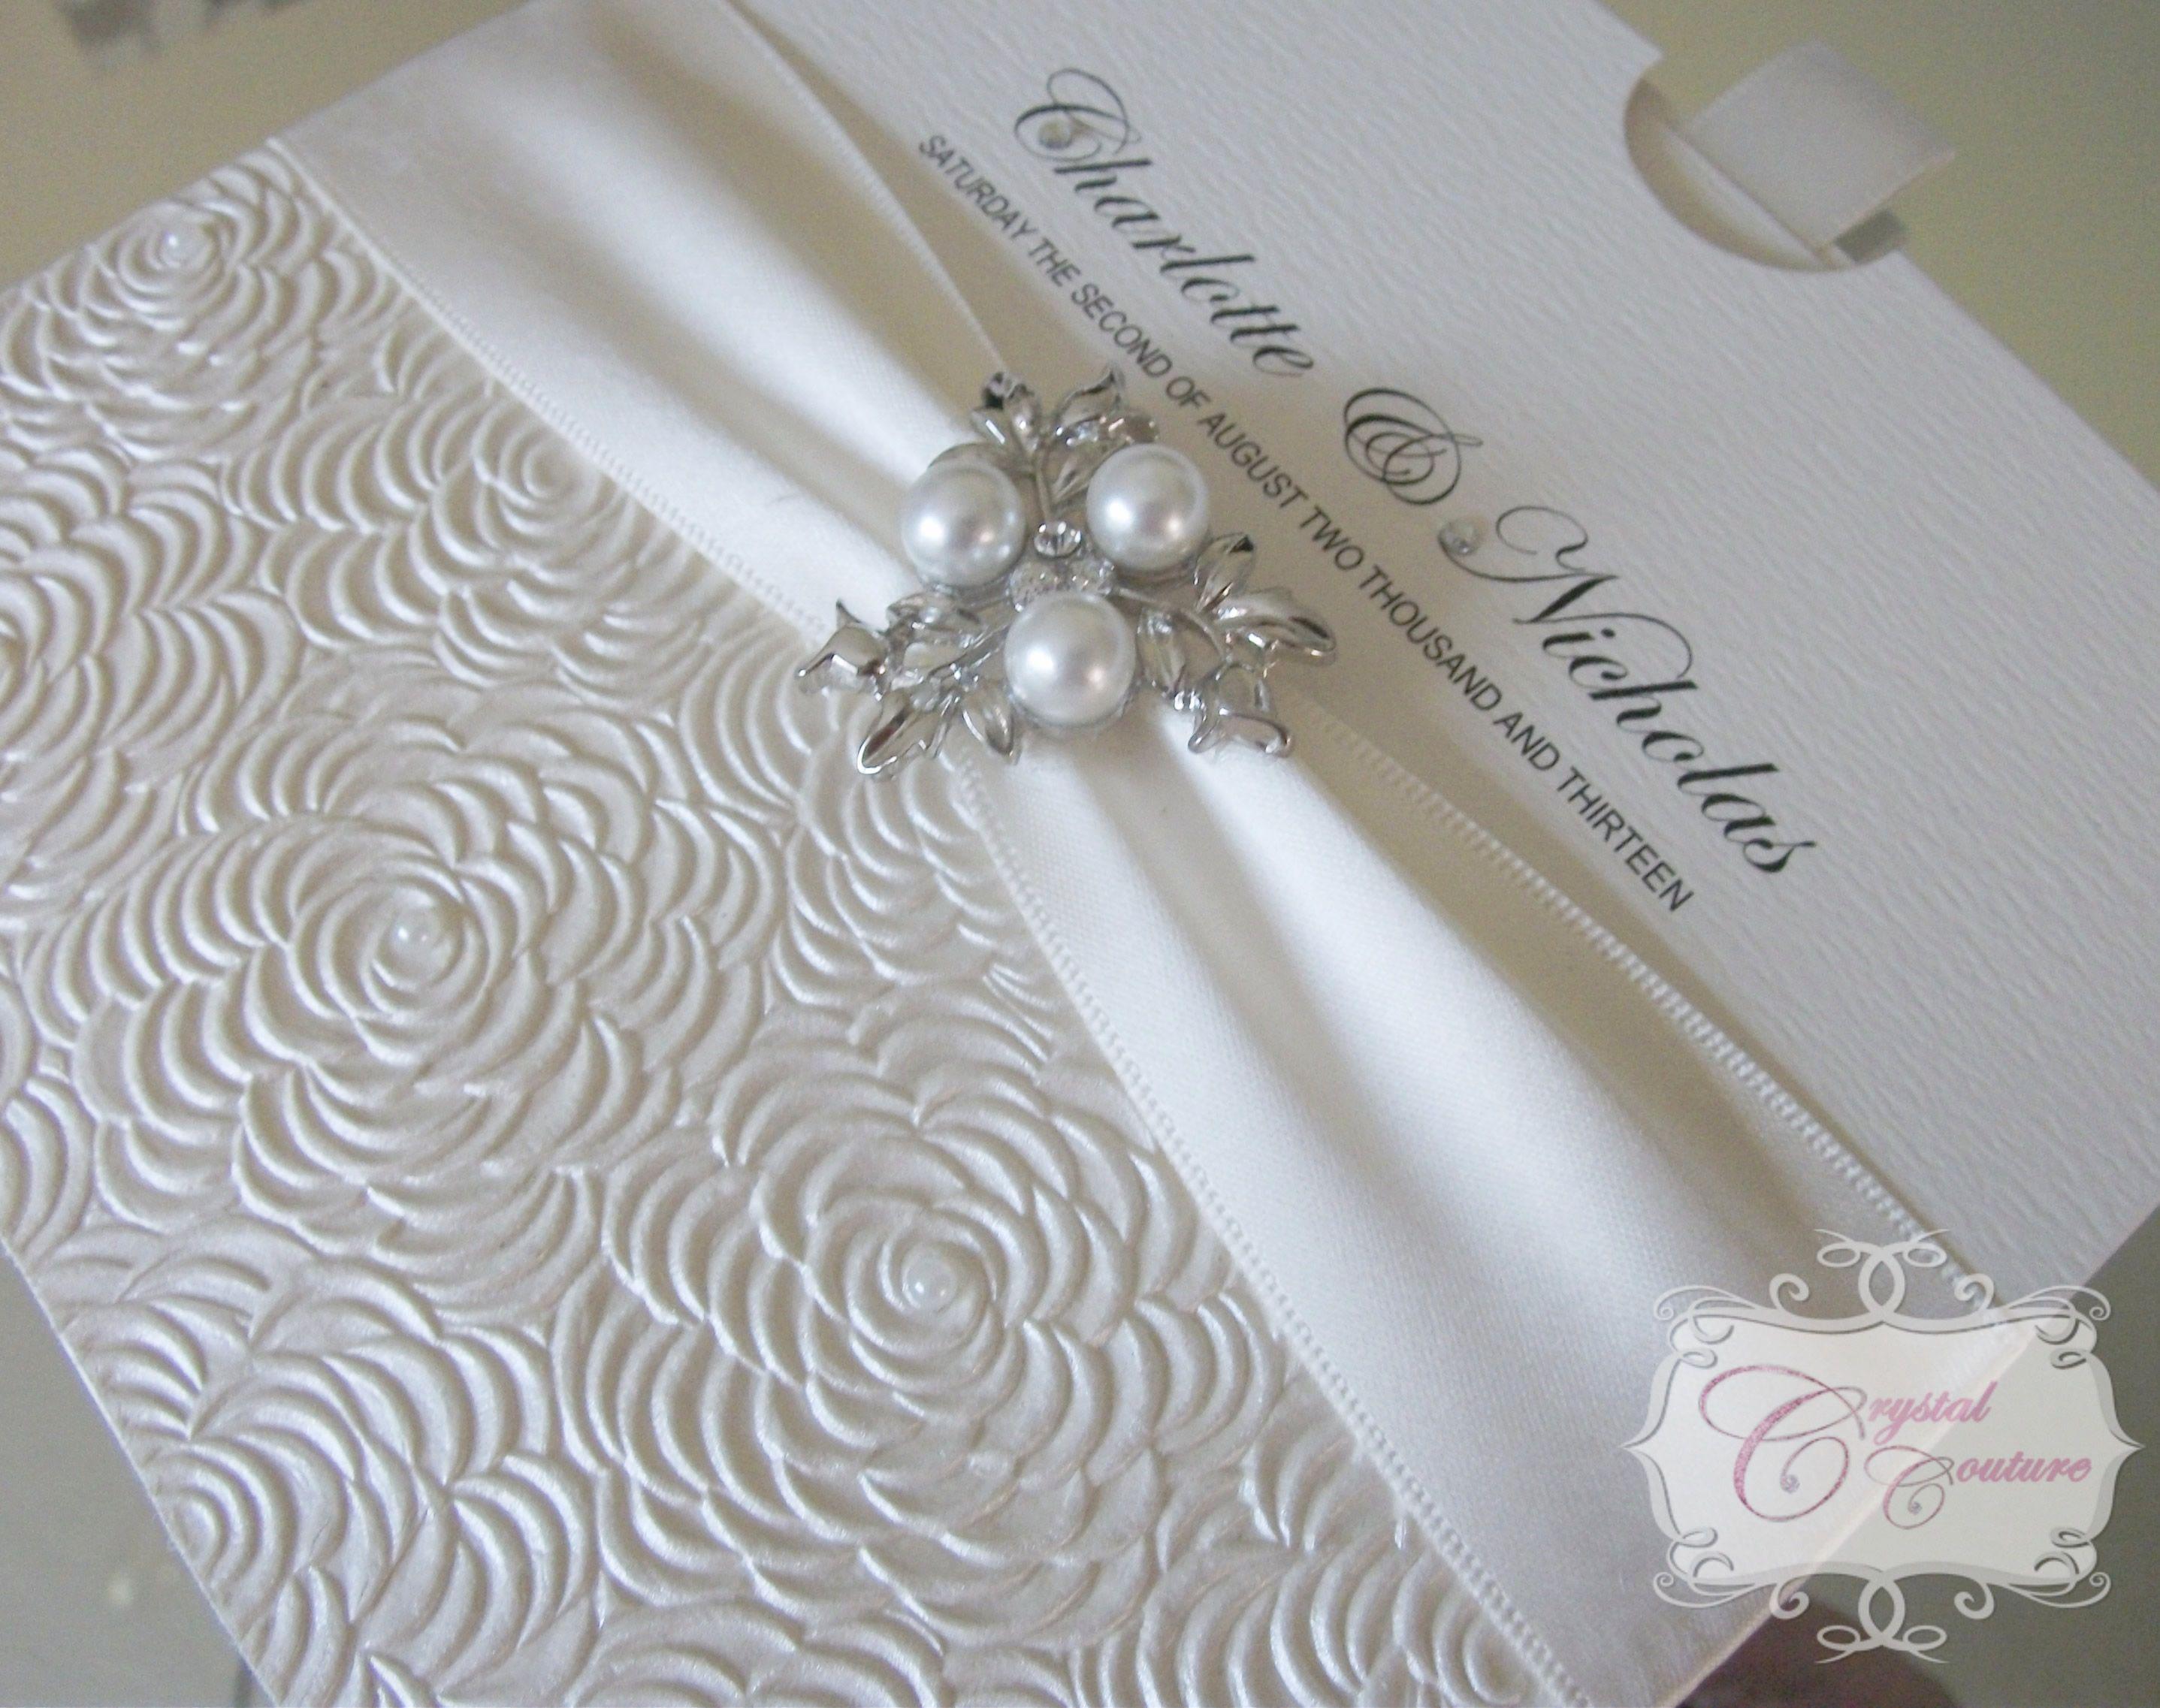 diamonds and pearls themed weddings | ... , luxury satin ribbon ...